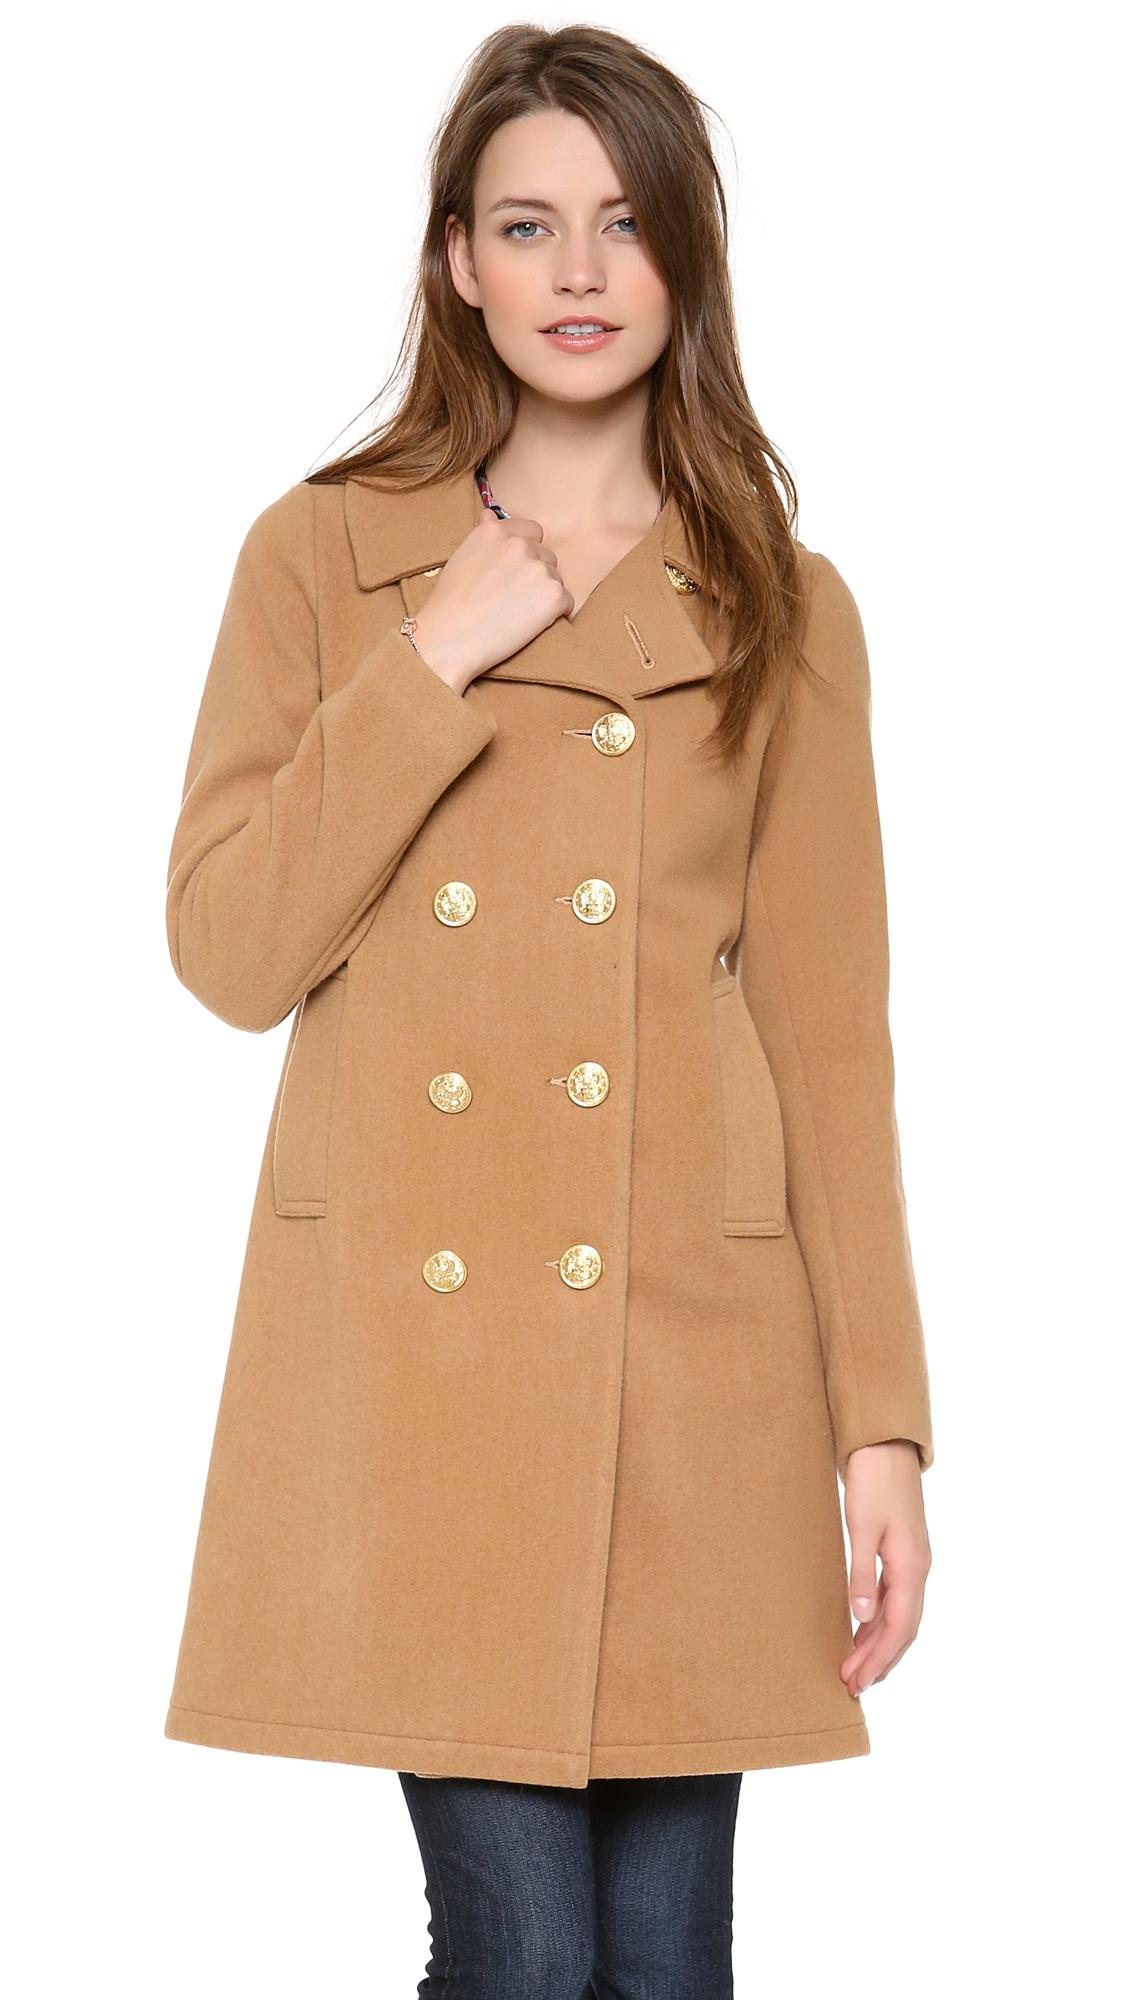 Womens brown wool pea coat